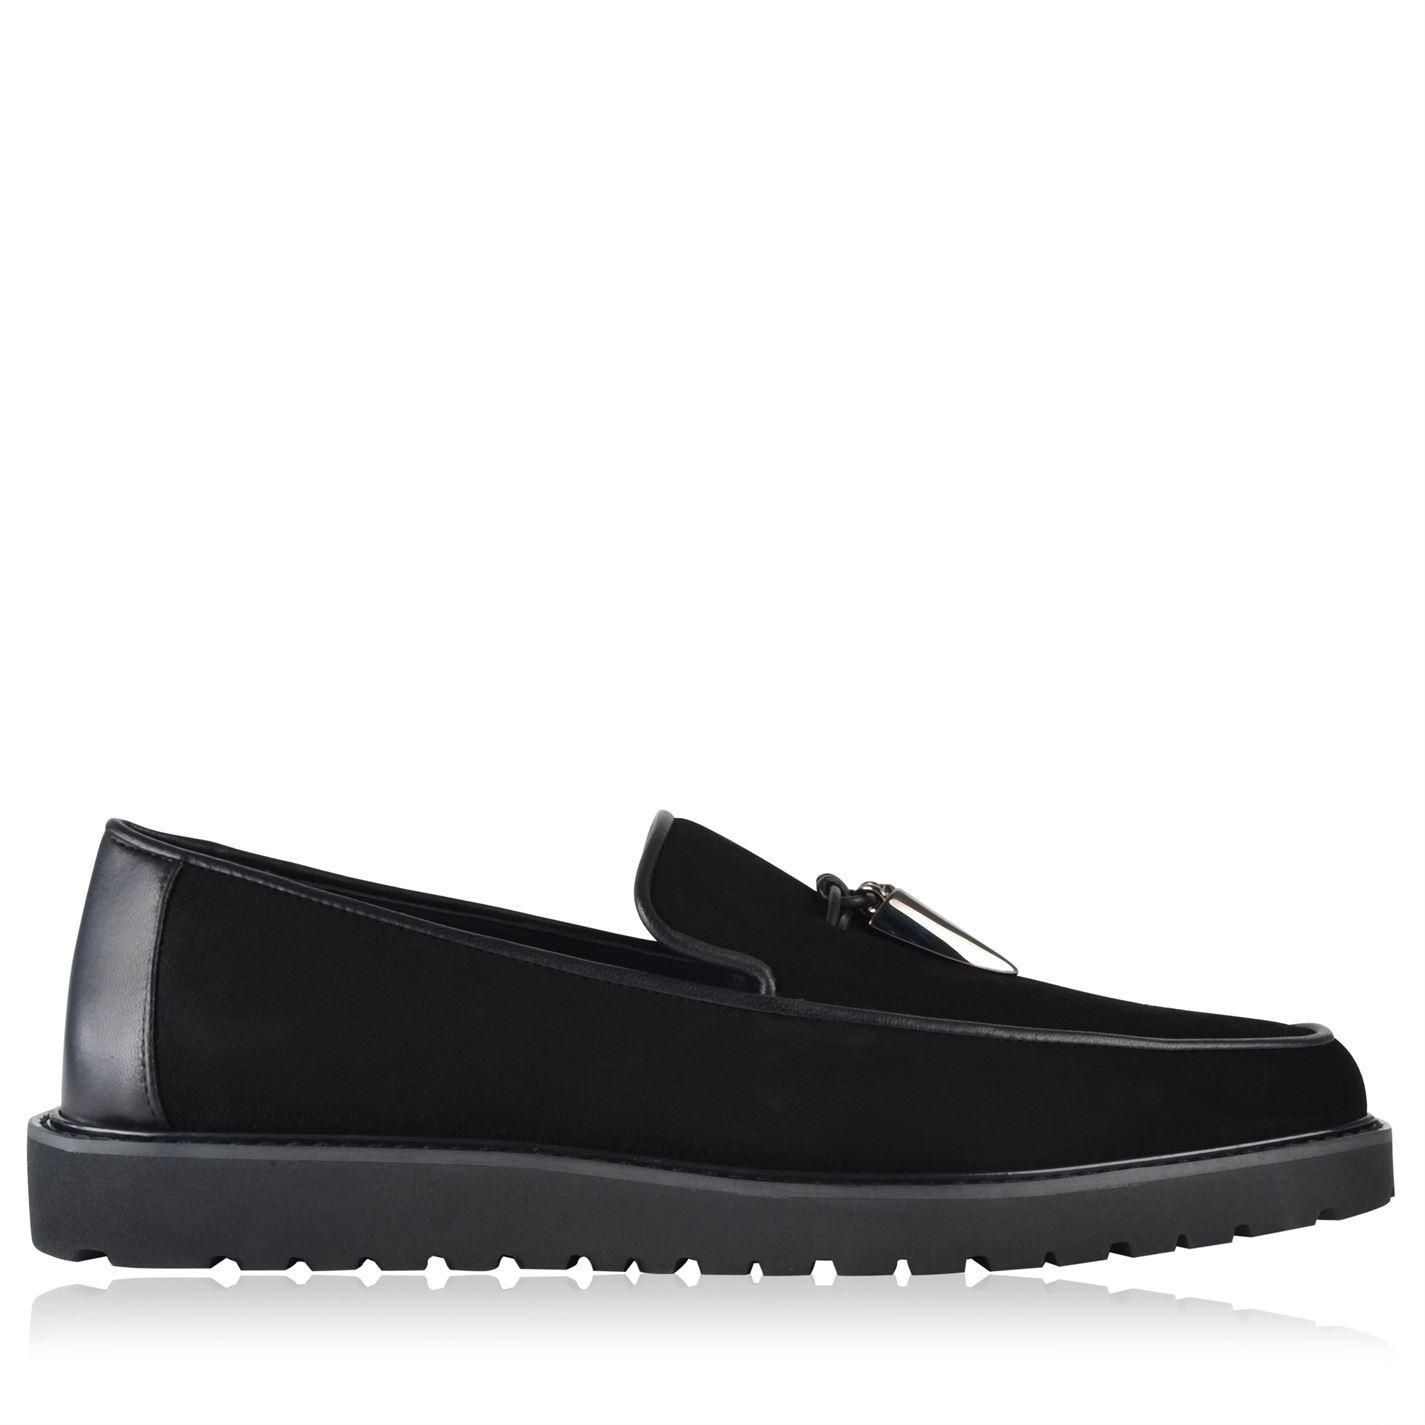 Flat shoes suede suede Fringe Logo Strass black gold Giuseppe Zanotti Hot X9K17V4D